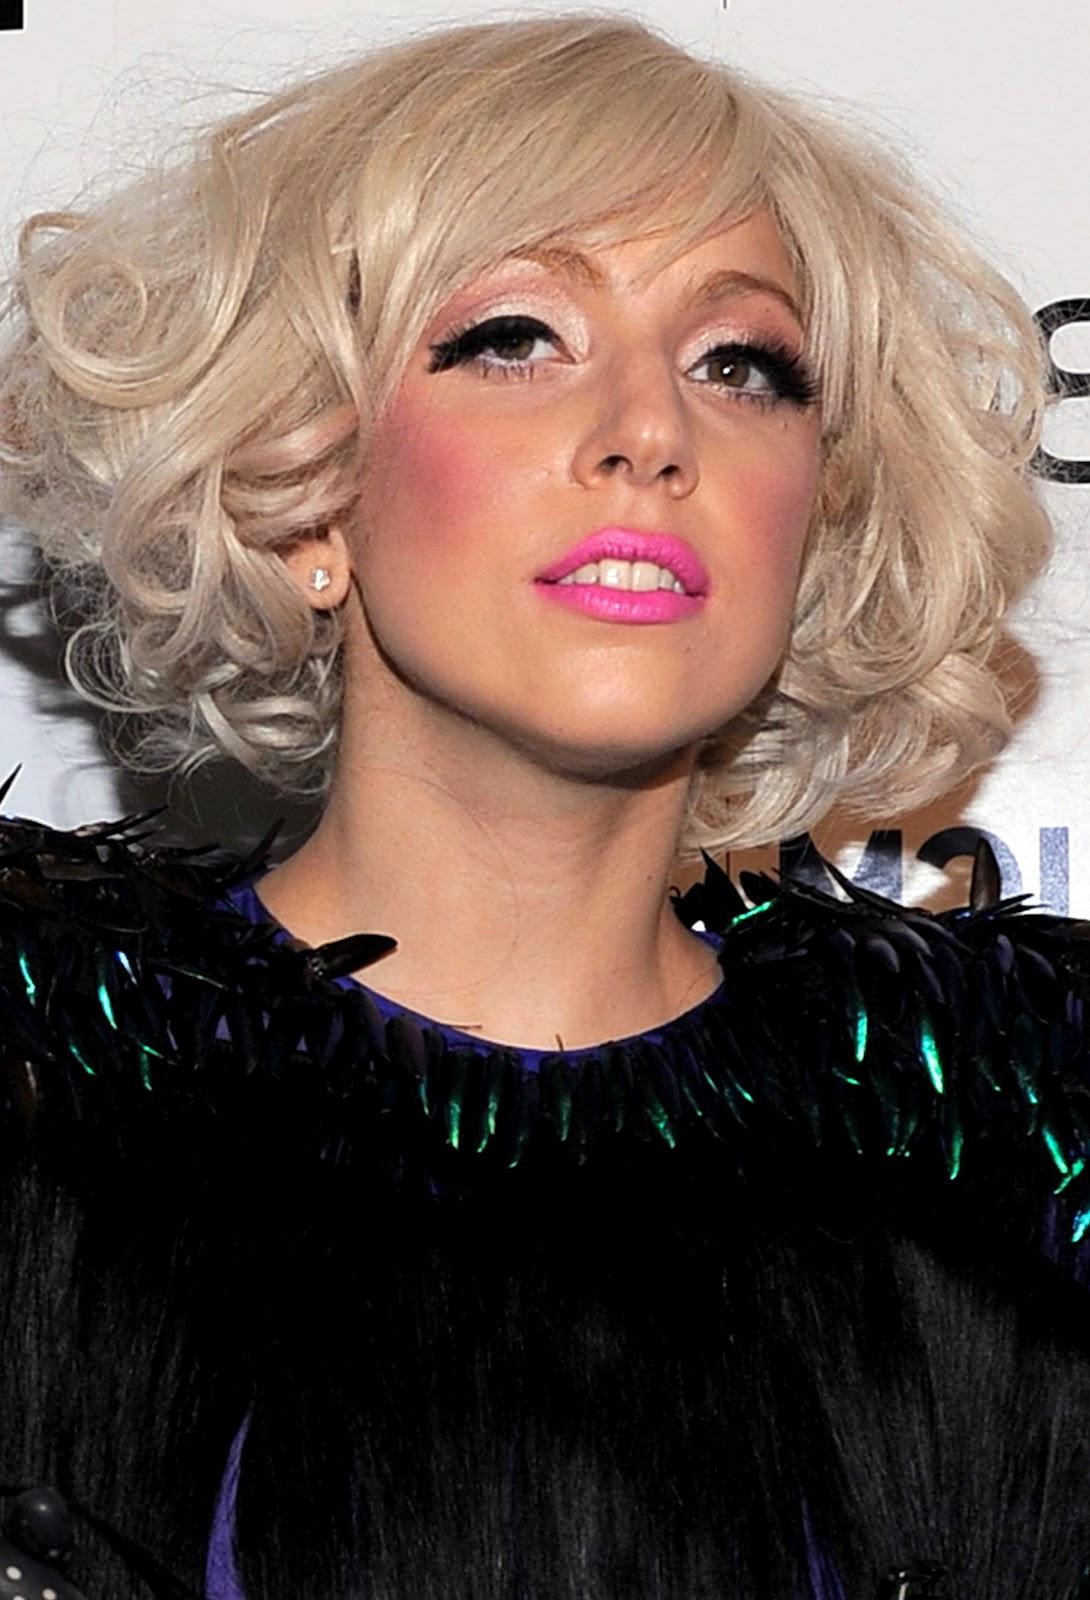 http://3.bp.blogspot.com/-q2b06X5unxU/UFYObYxwgoI/AAAAAAAAEhQ/mpY9UK8s_es/s1600/lady_gaga_pictures-%7B4%7D.jpg